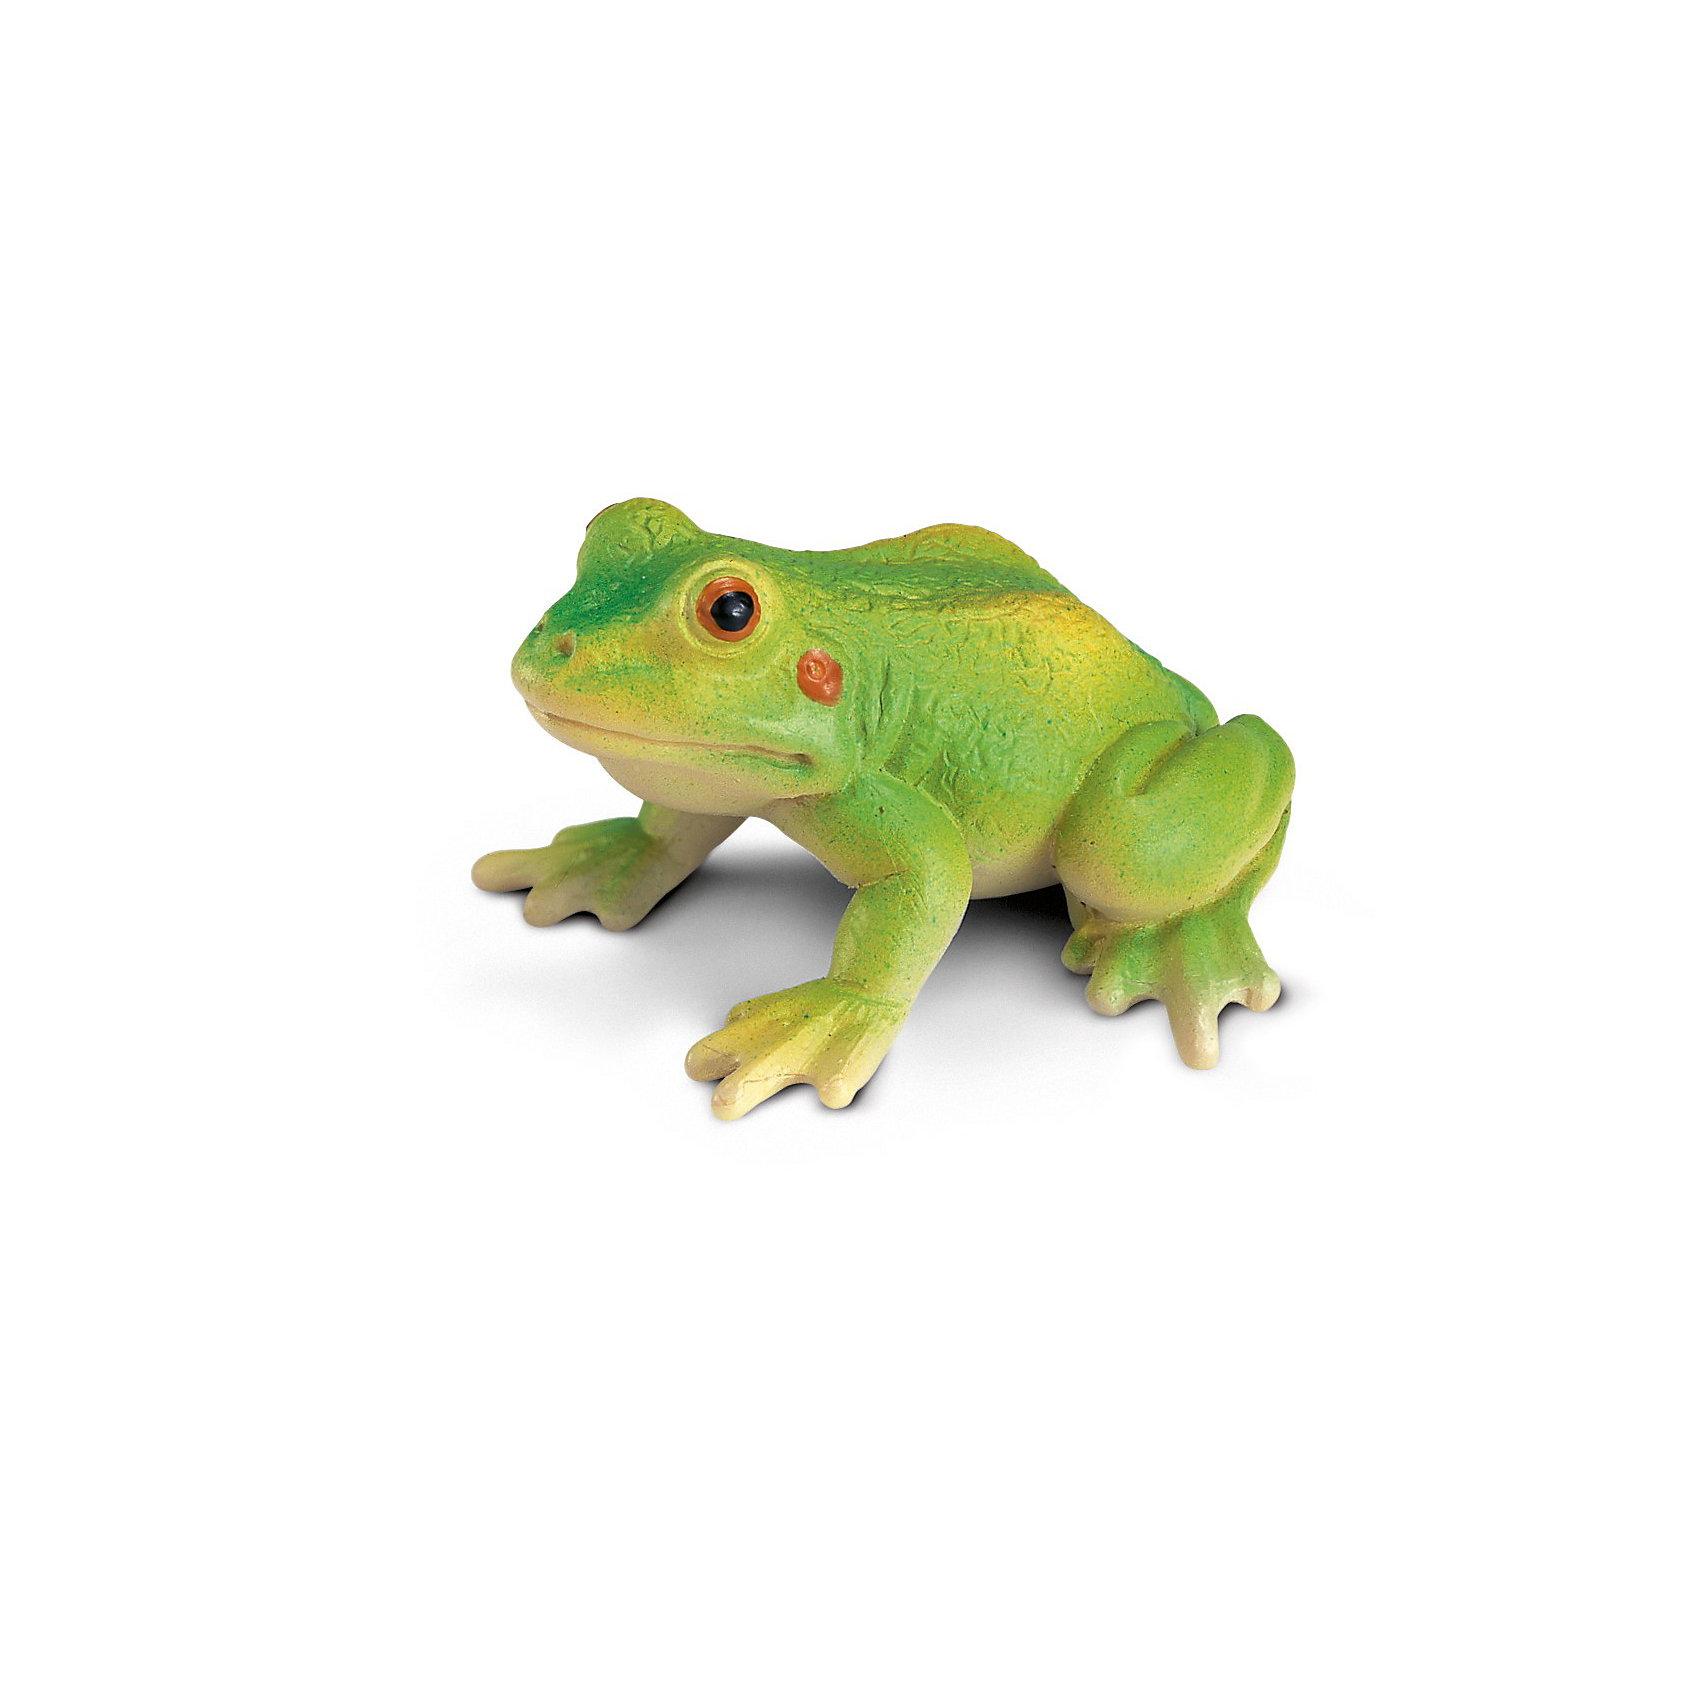 Schleich Schleich Лягушка. Серия Домашние животные фигурки игрушки schleich набор древние травоядные животные